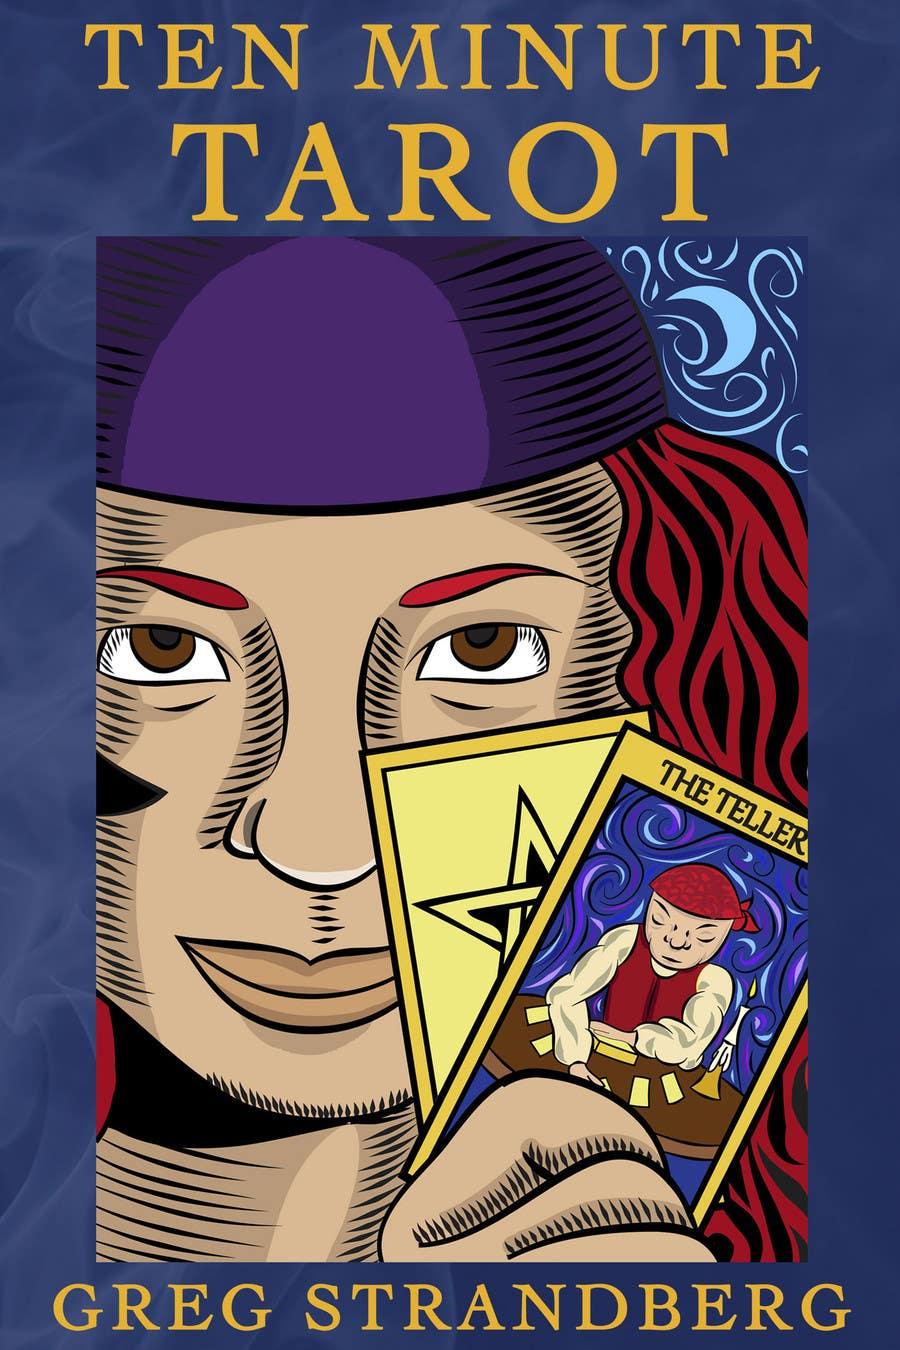 Bài tham dự cuộc thi #                                        173                                      cho                                         Create a Mesmerizing Tarot eBook Cover